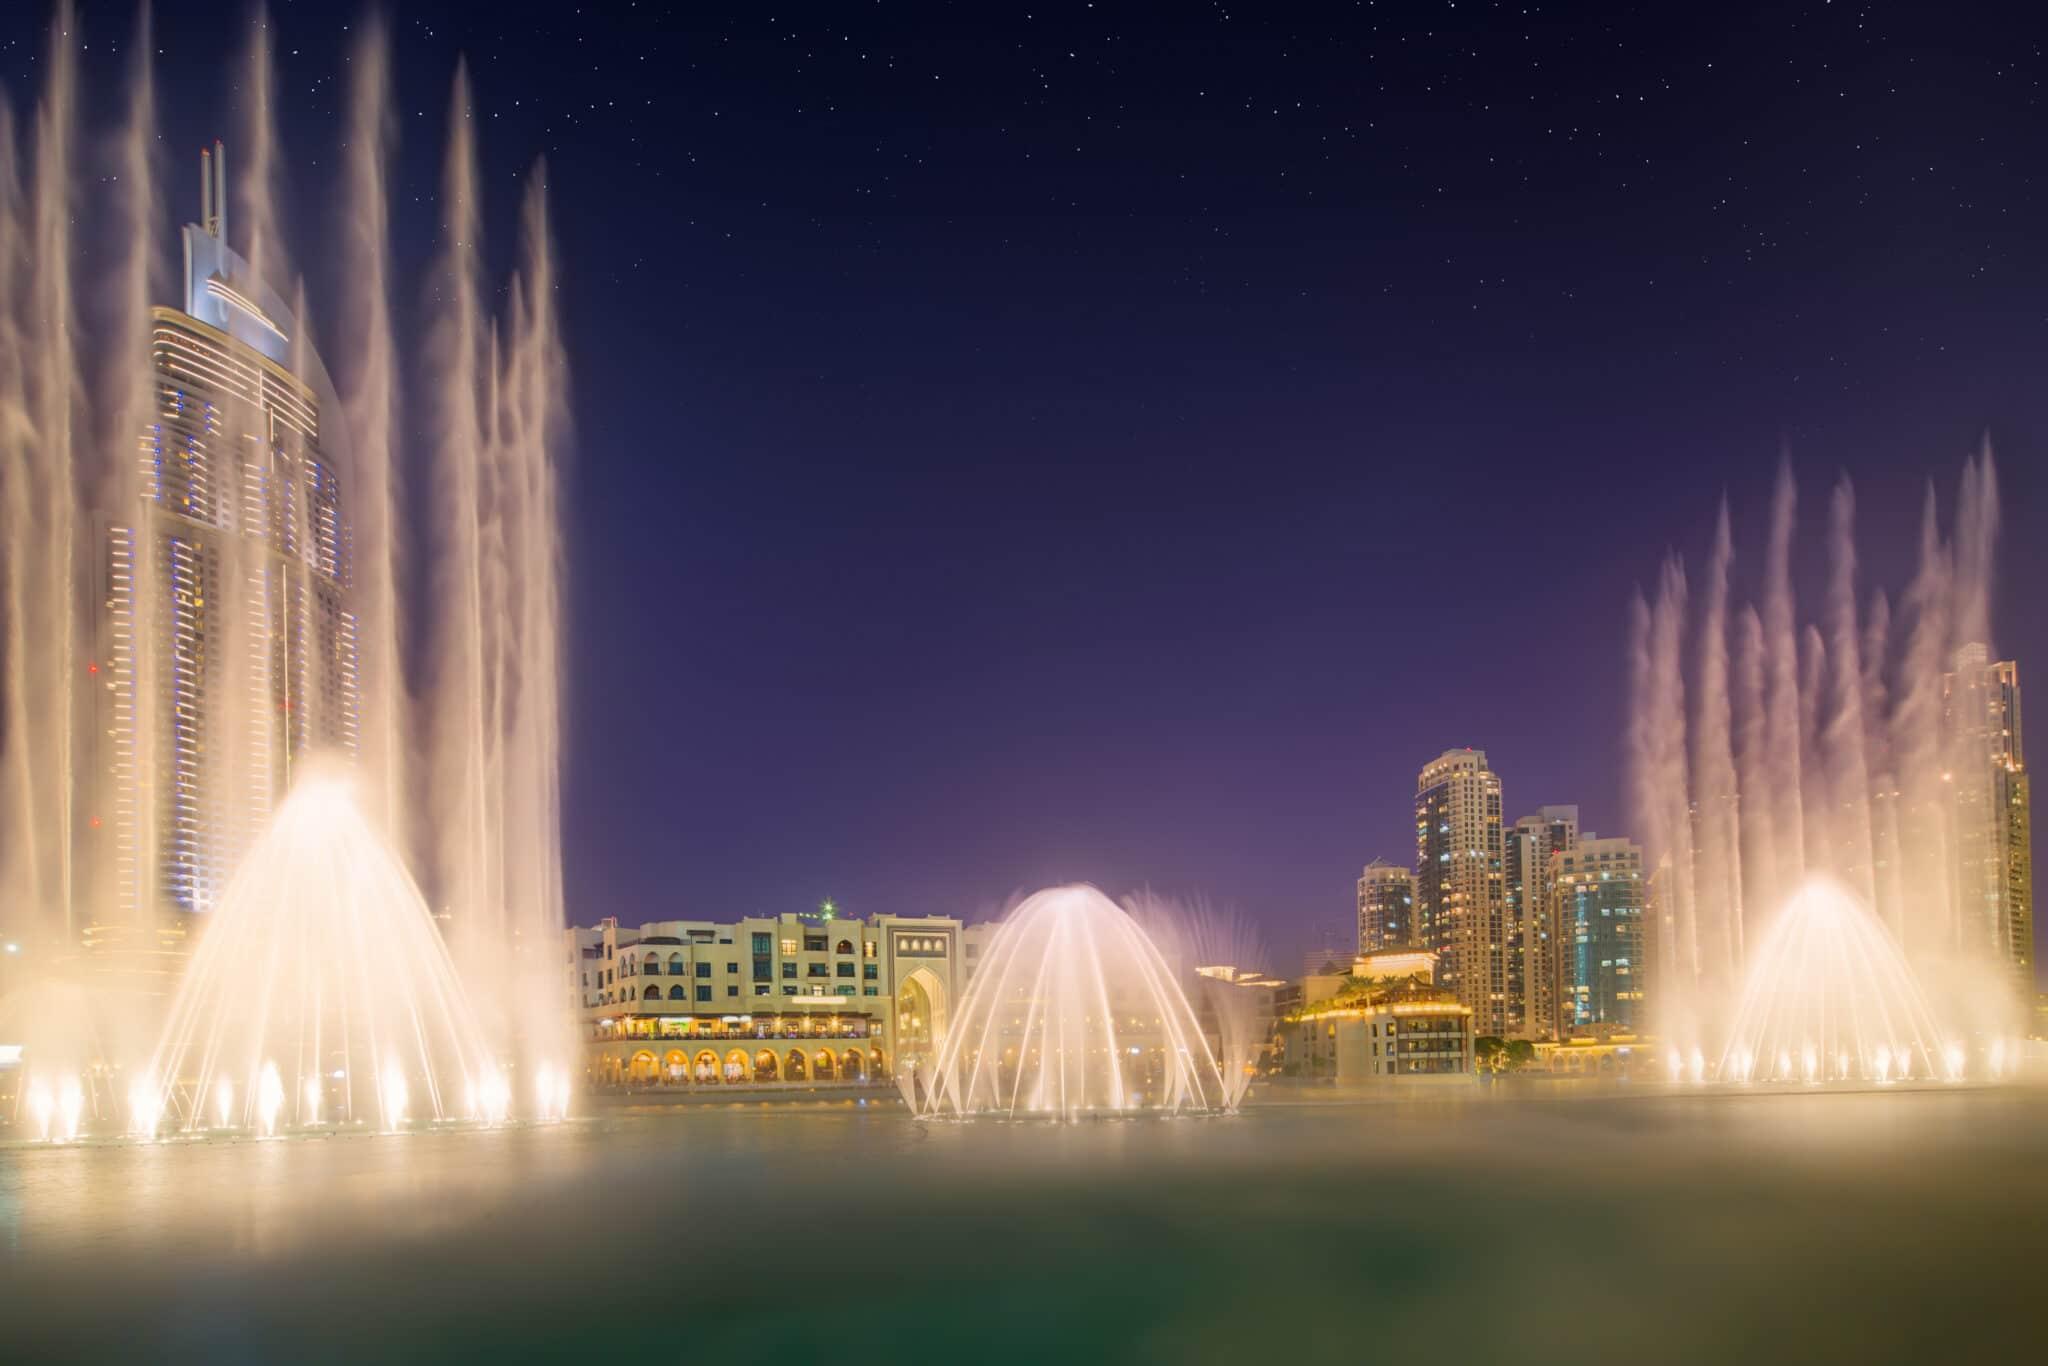 familieoplevelser-i-Dubai - AdobeStock_81069879.jpeg